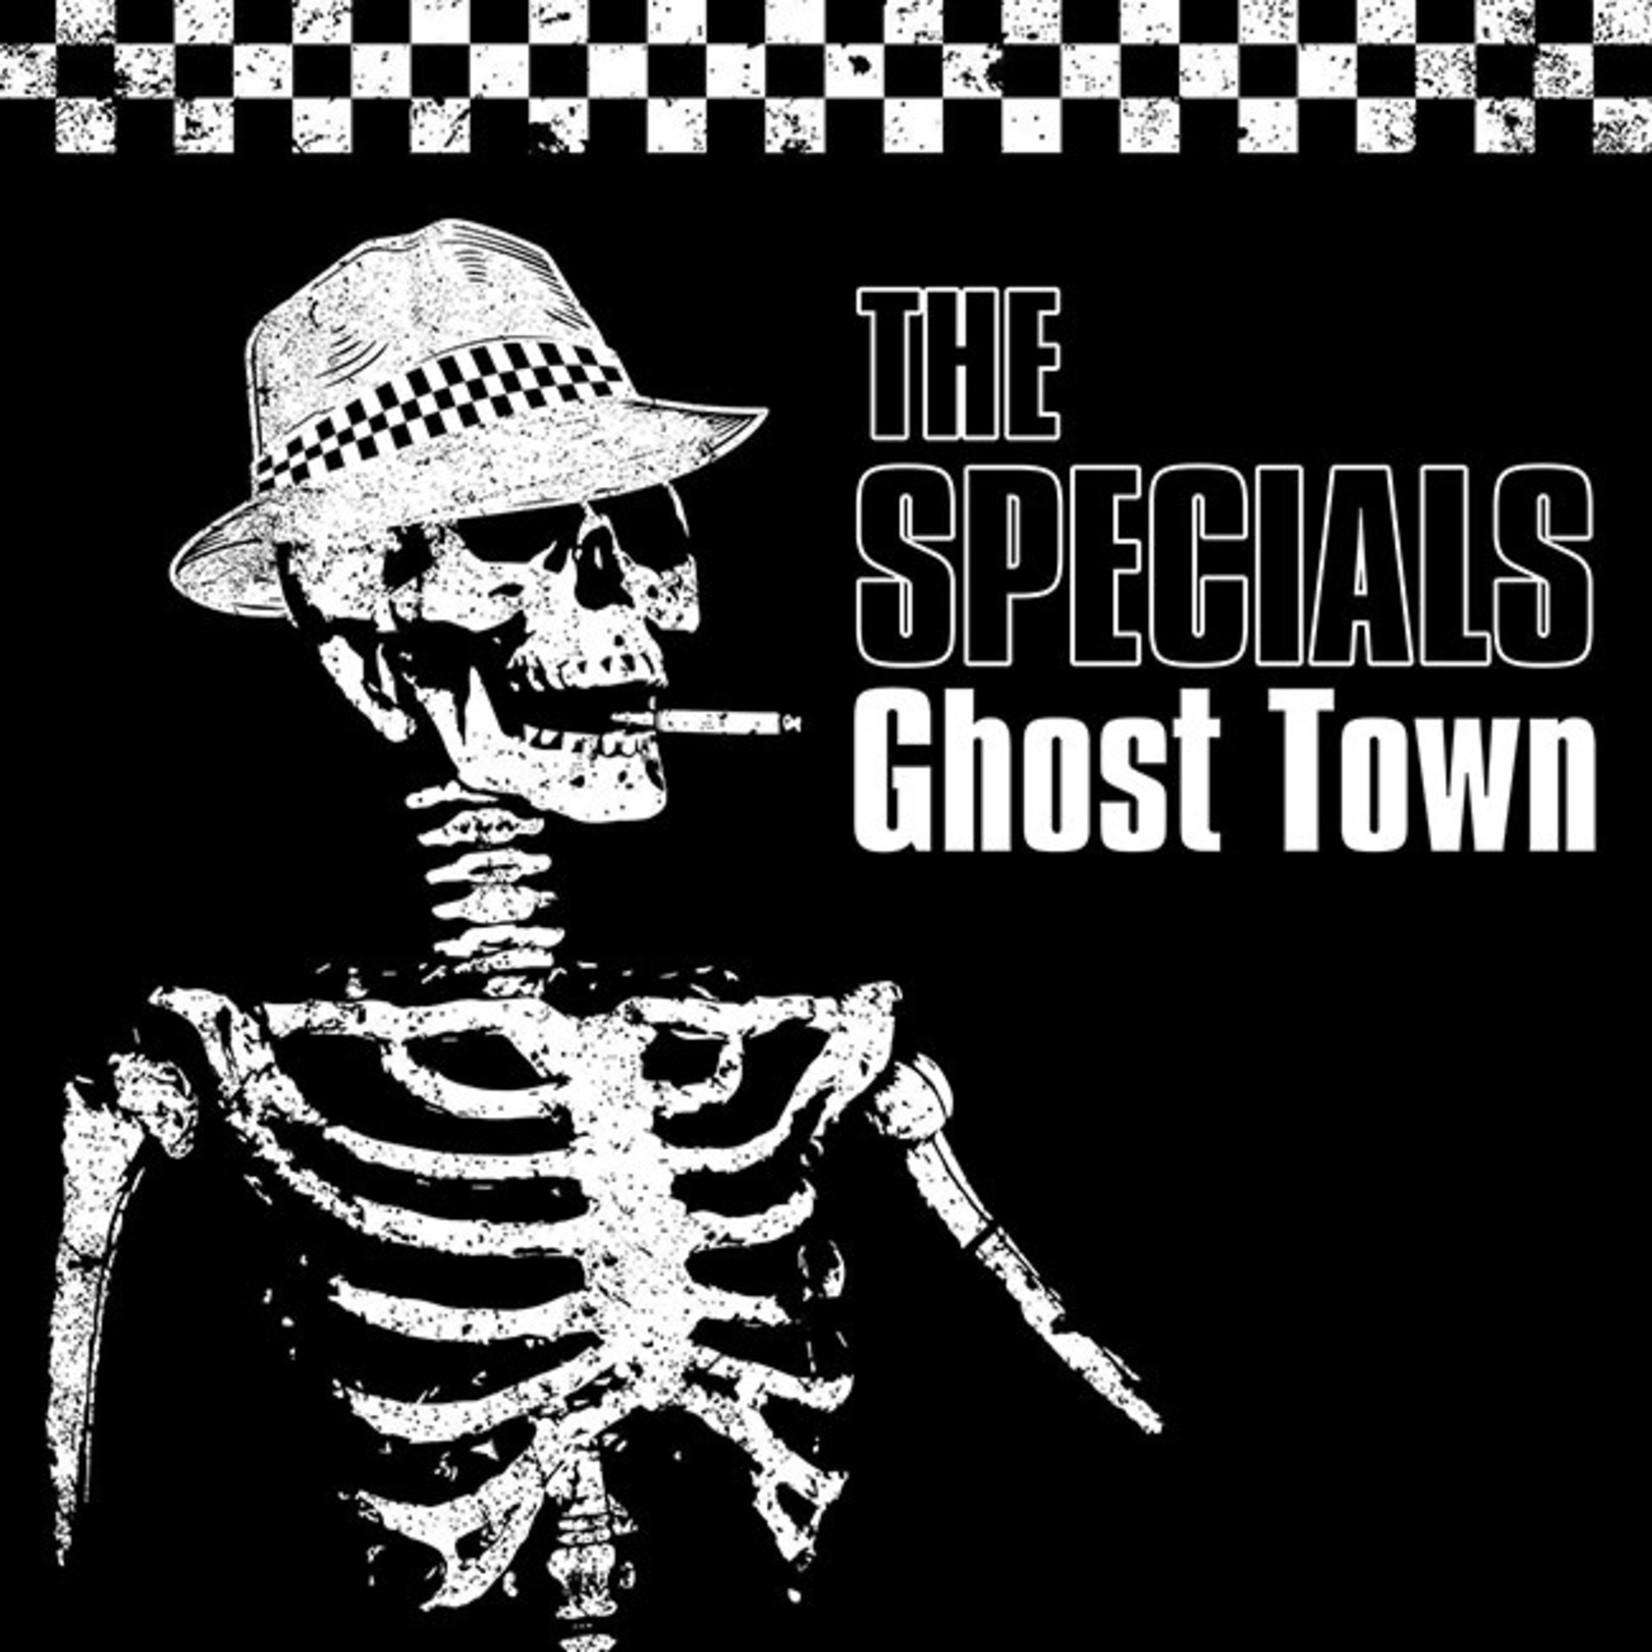 [New] Specials: Ghost Town (splatter vinyl)